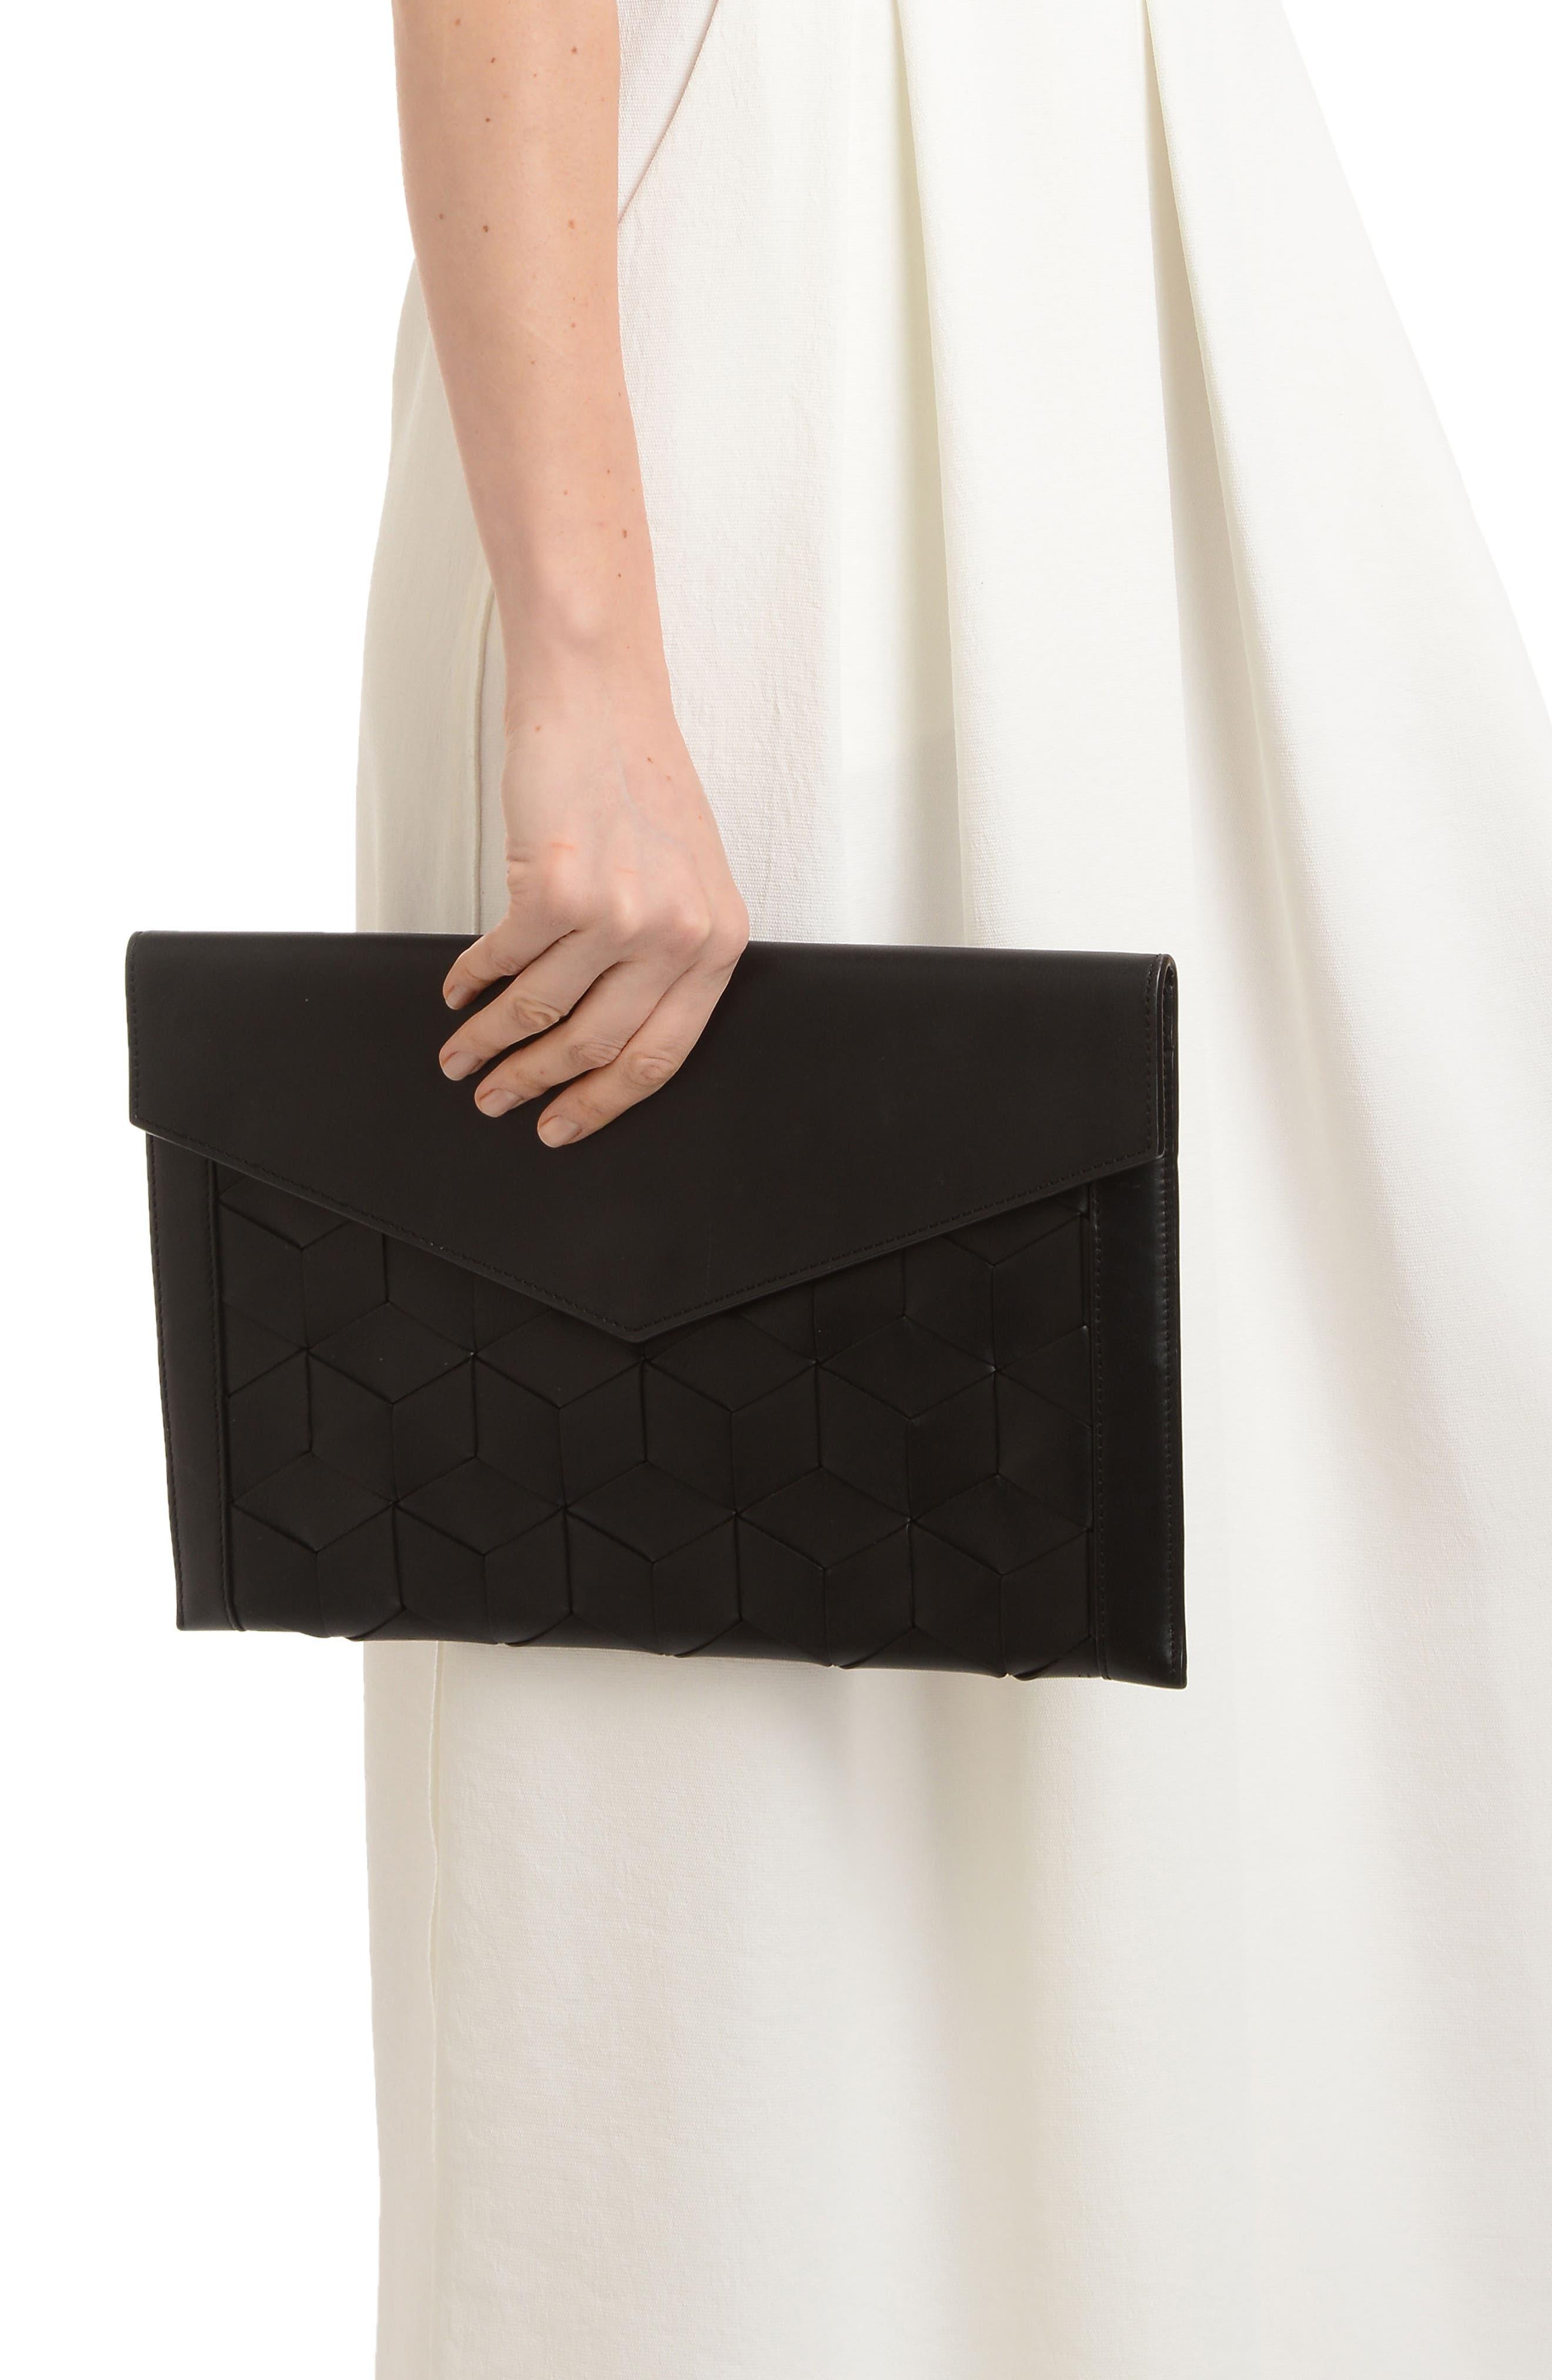 Mingle Woven Calfskin Leather Clutch,                             Alternate thumbnail 7, color,                             BLACK